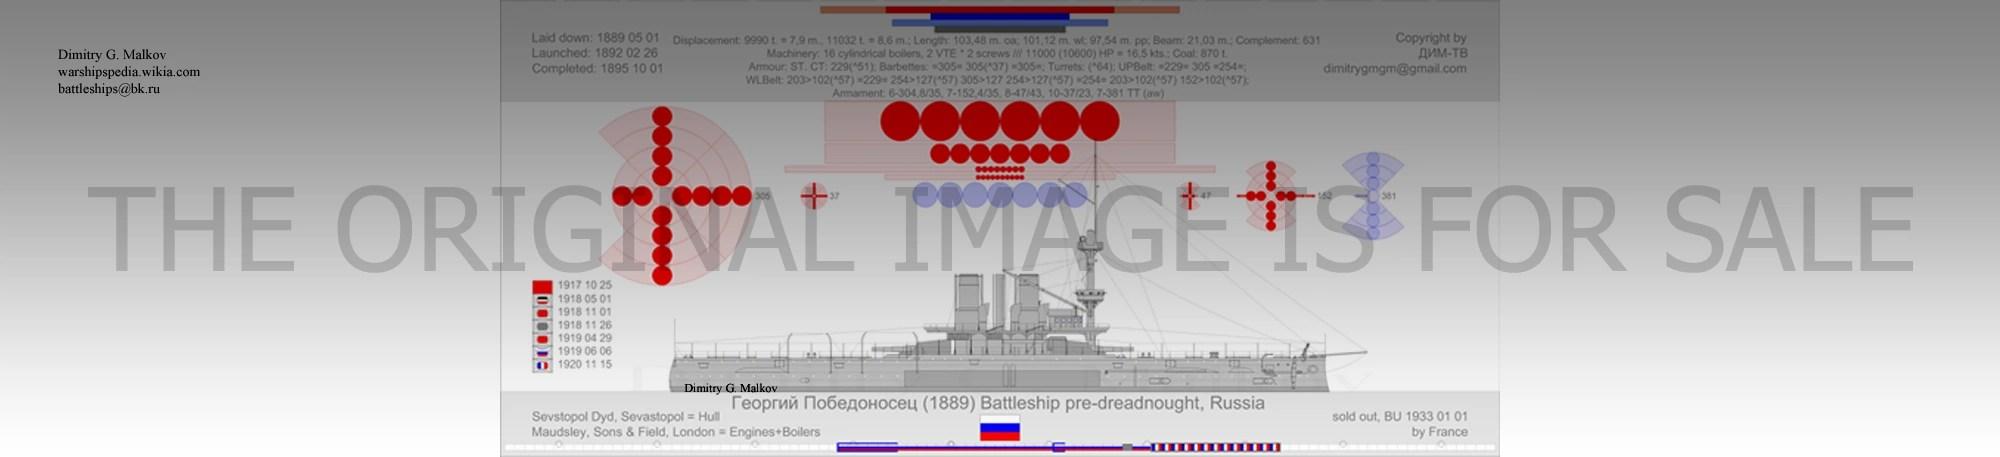 medium resolution of built in russia flagrussia 1889 battleship pre dreadnought 0 separator